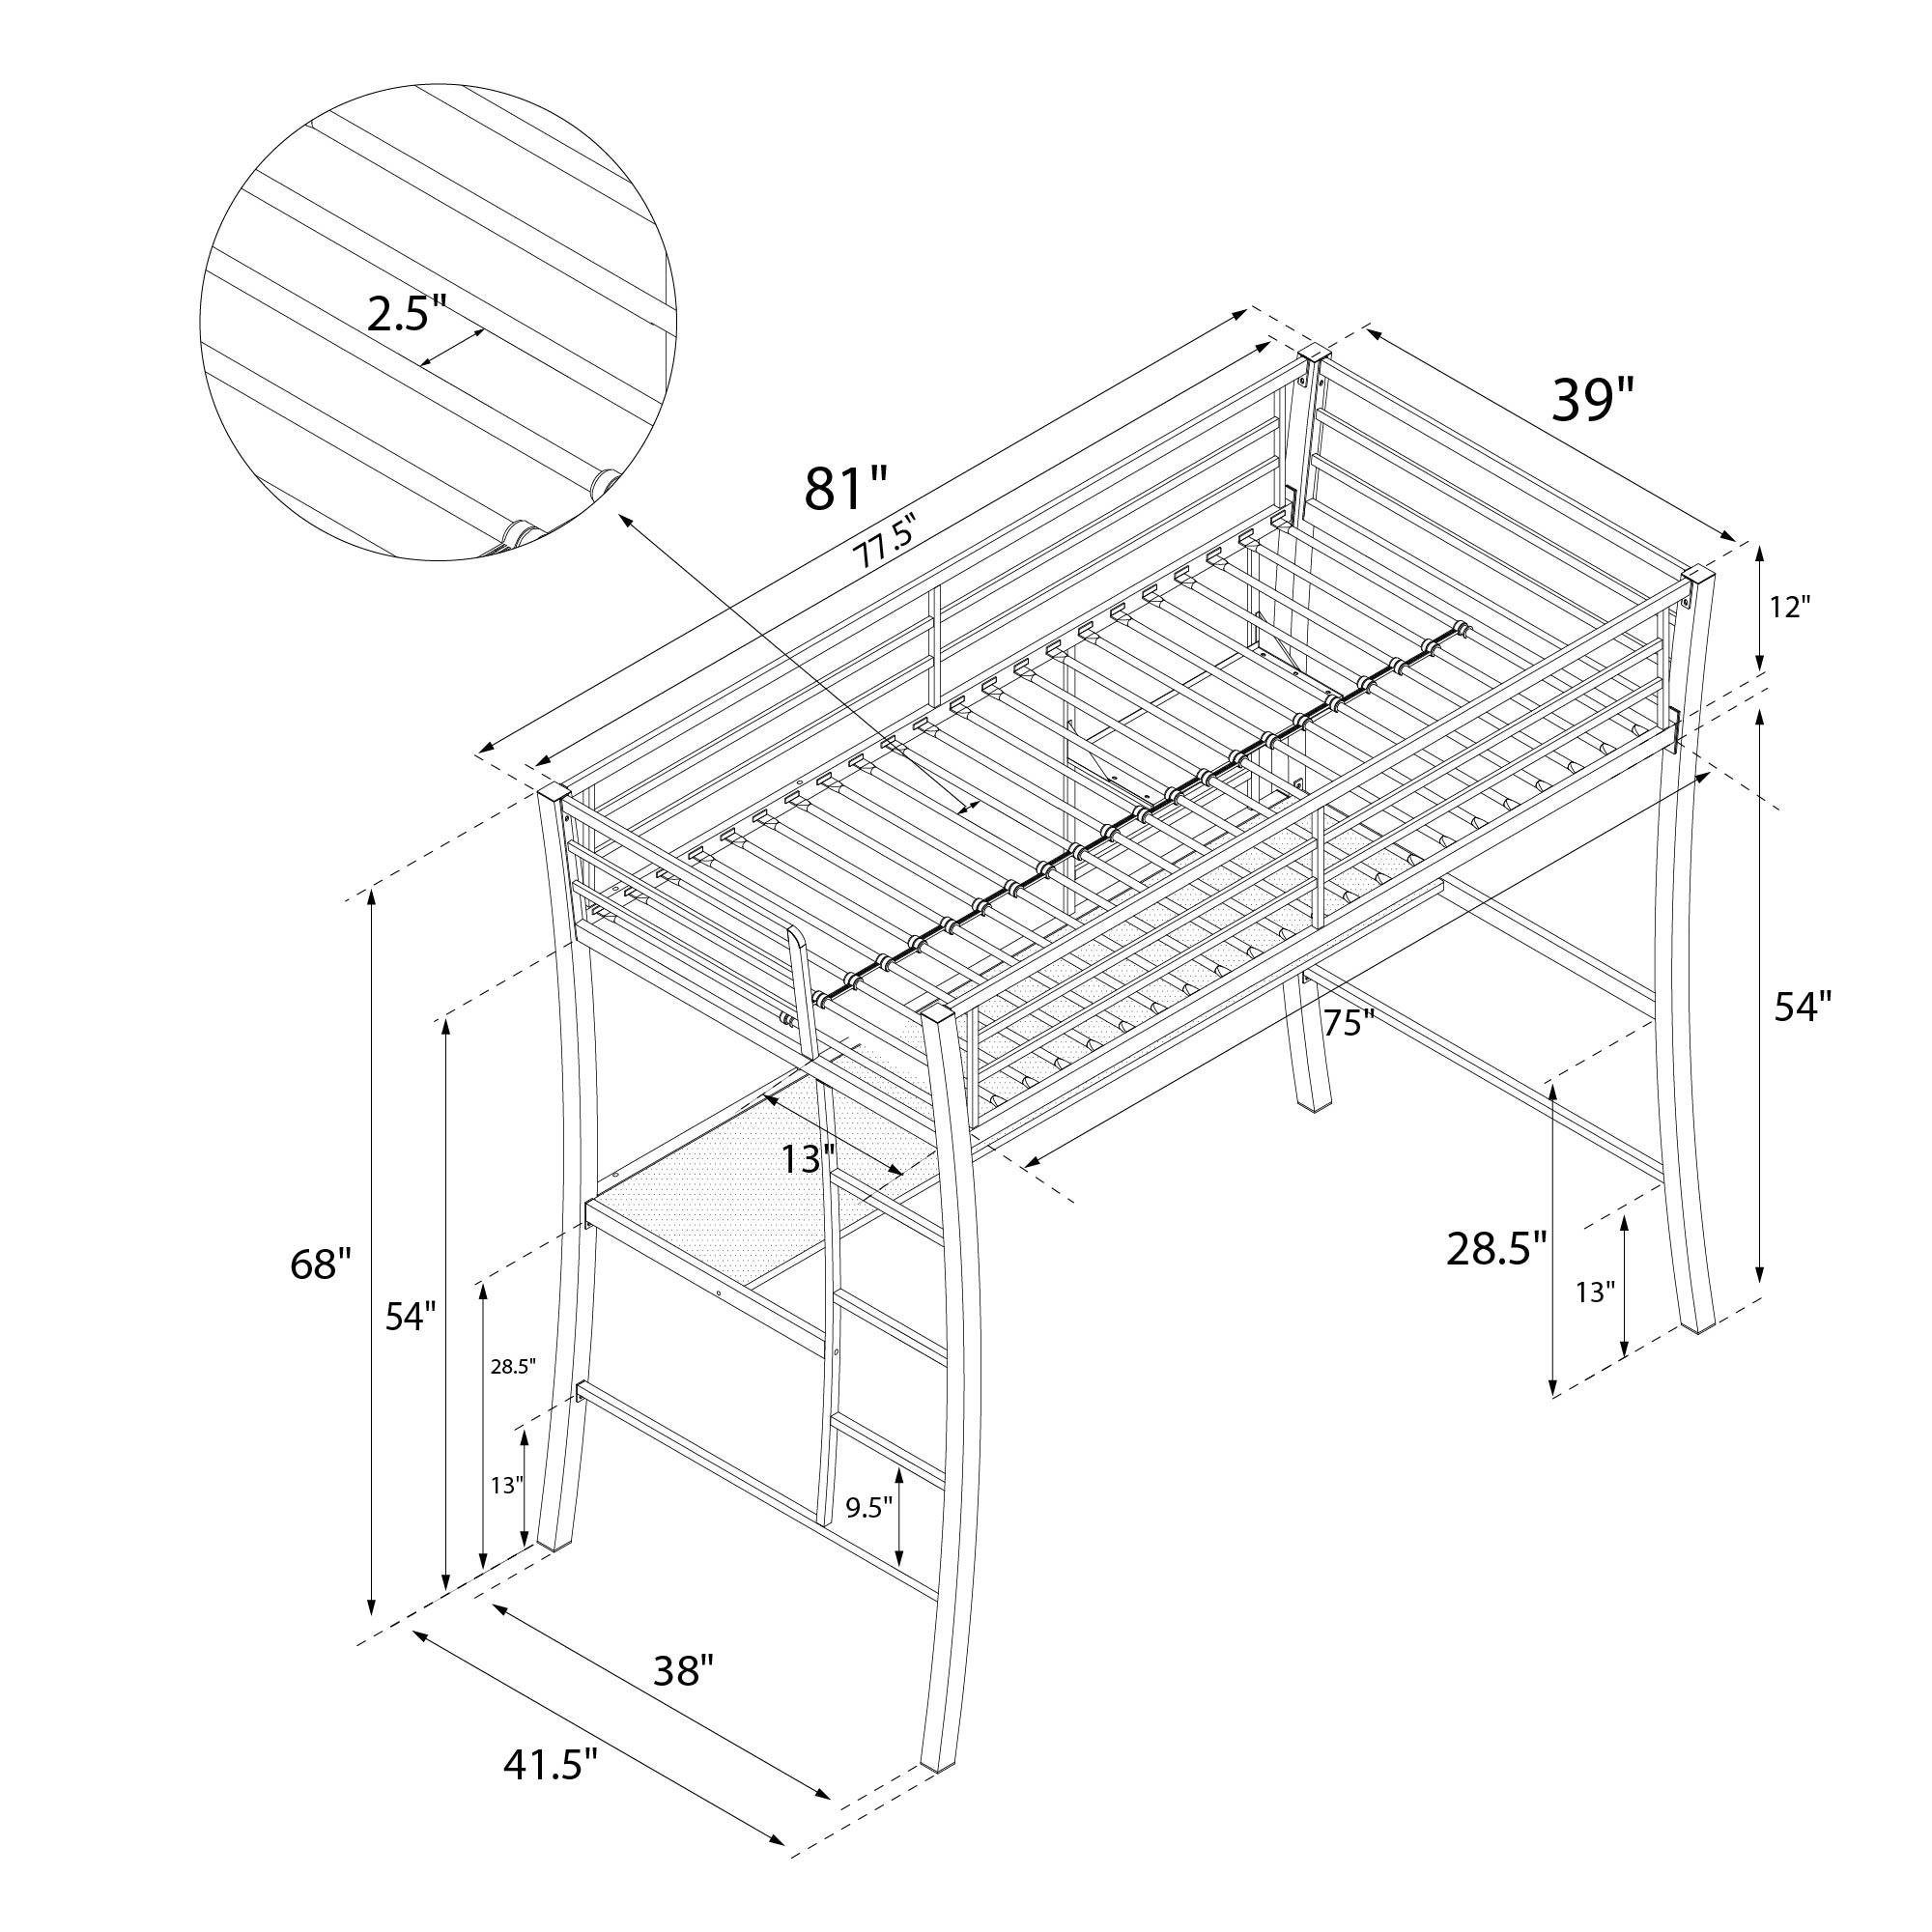 Novogratz Brett Twin Loft with Desk and Shelf, Contemporary Space-Saving Design, Sturdy Metal Frame with Metal Slats, Twin Size, Gunmetal Gray